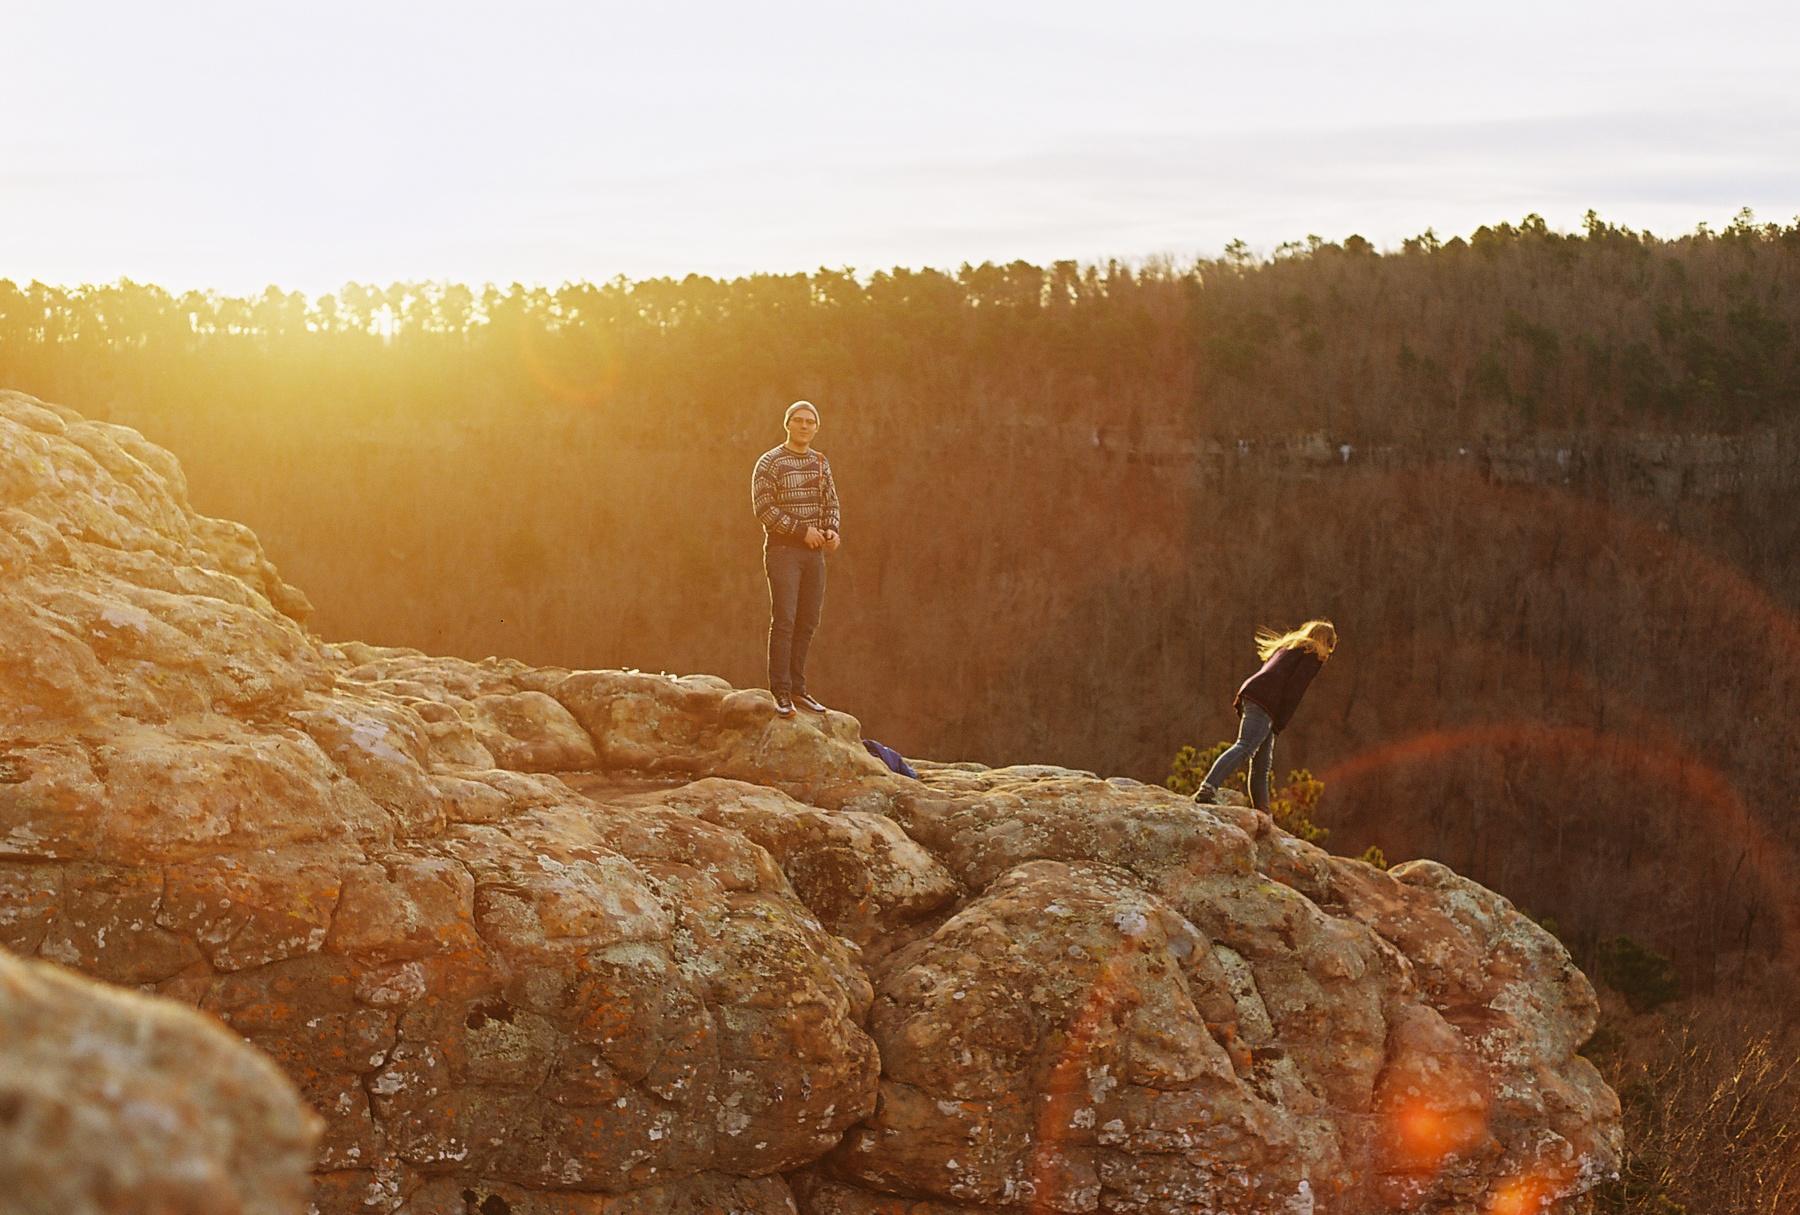 Ben Matthews // Shoot More Film - image 8 - student project